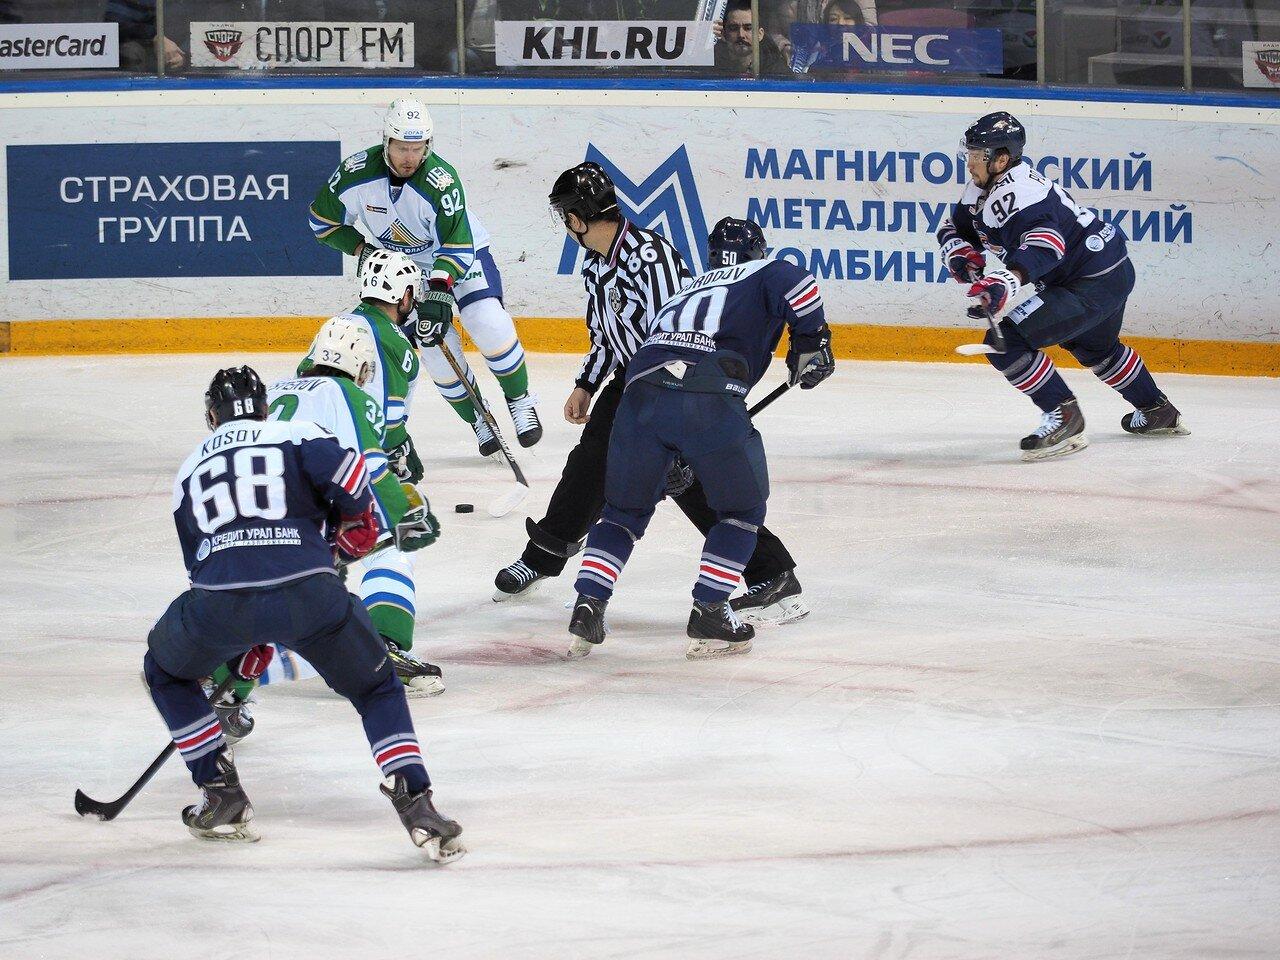 78Плей-офф 2016 Восток Финал Металлург - Салават Юлаев 23.03.2016